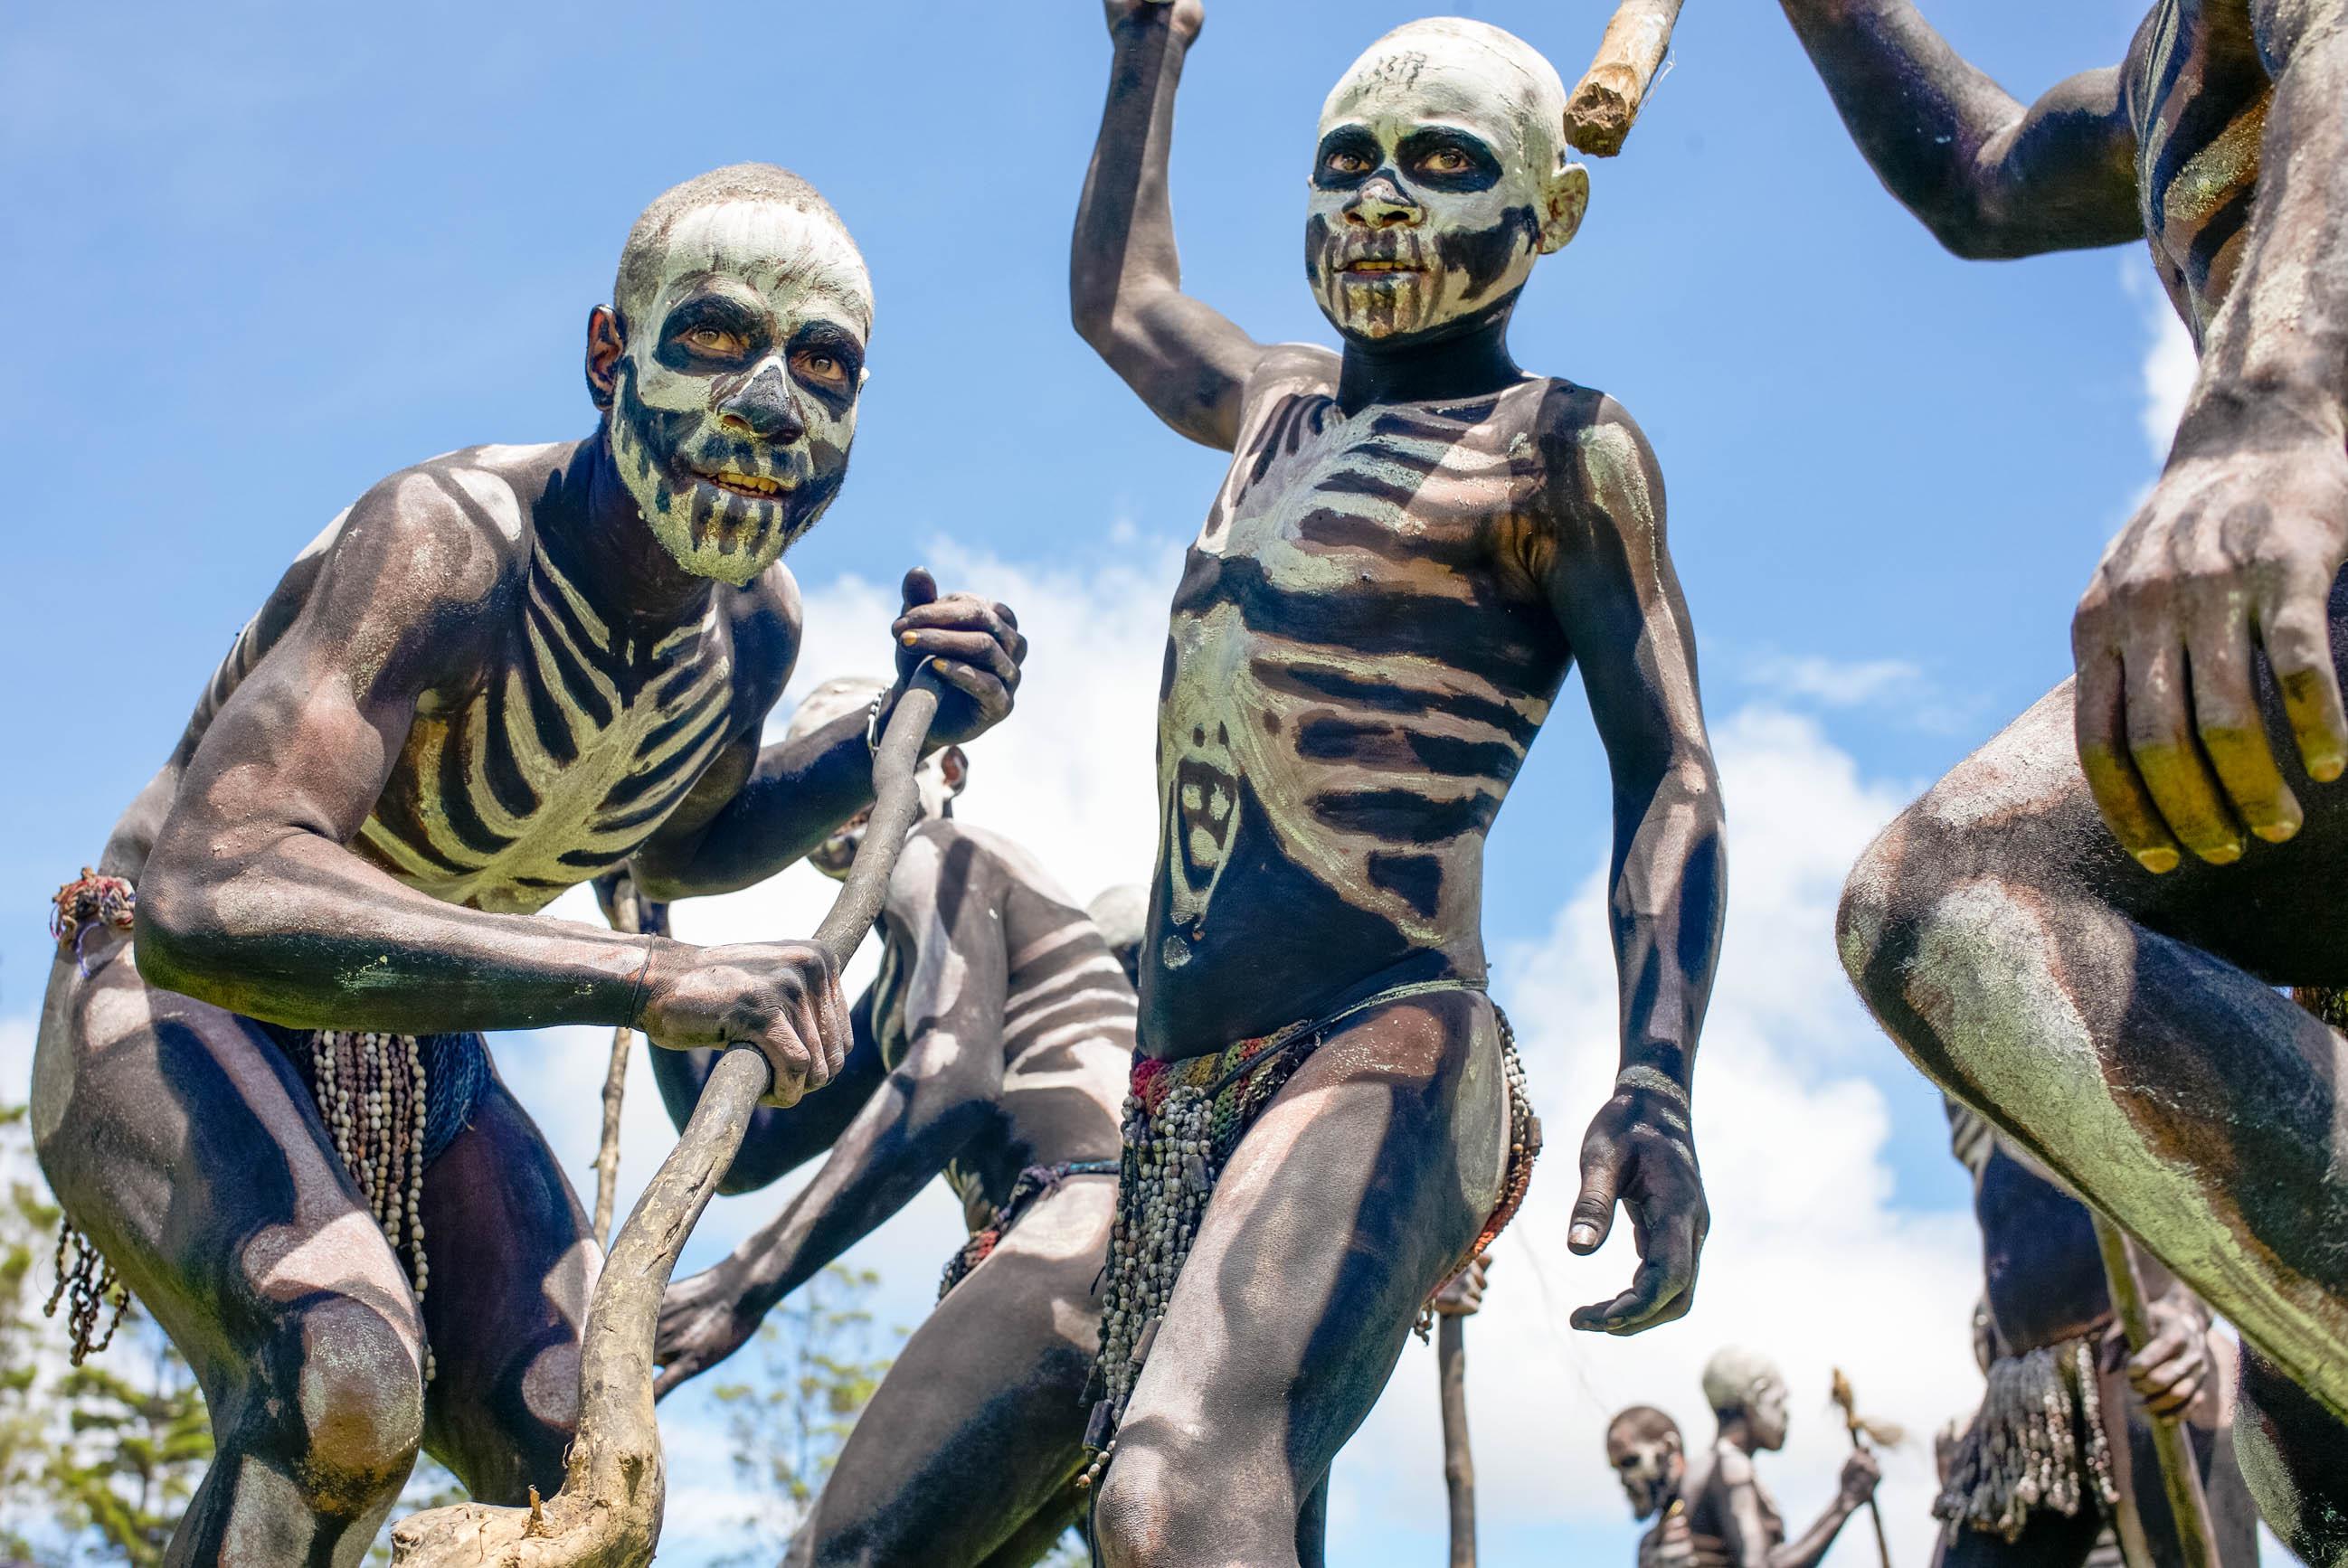 https://bubo.sk/uploads/galleries/7442/lubosfellner_papuanovaguinea_l1008869.jpg